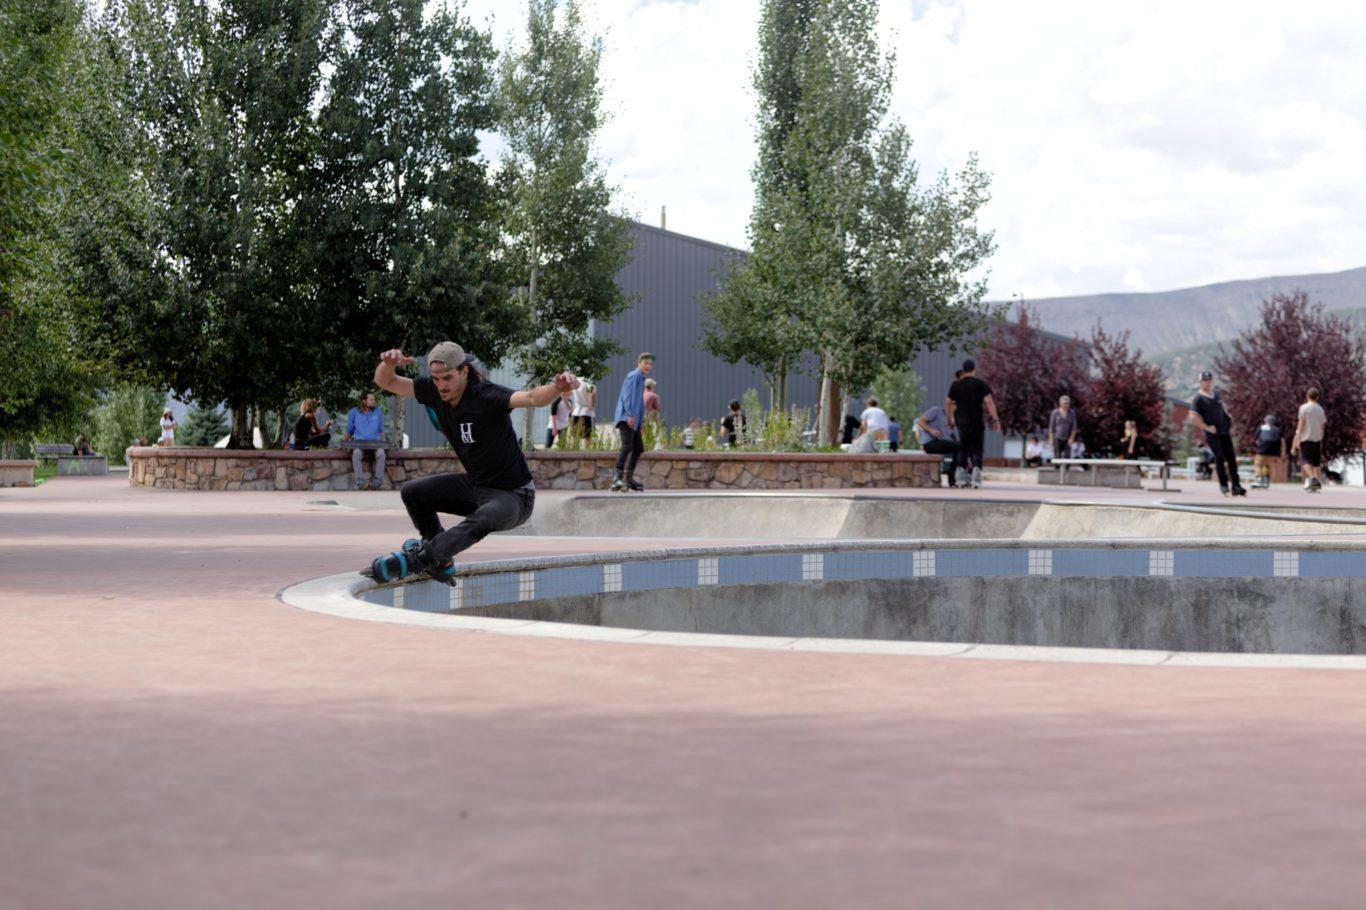 14-Colorado-Road-Trip-2016-Jared-McBay-Sweatstance-Edwards-Kuhn